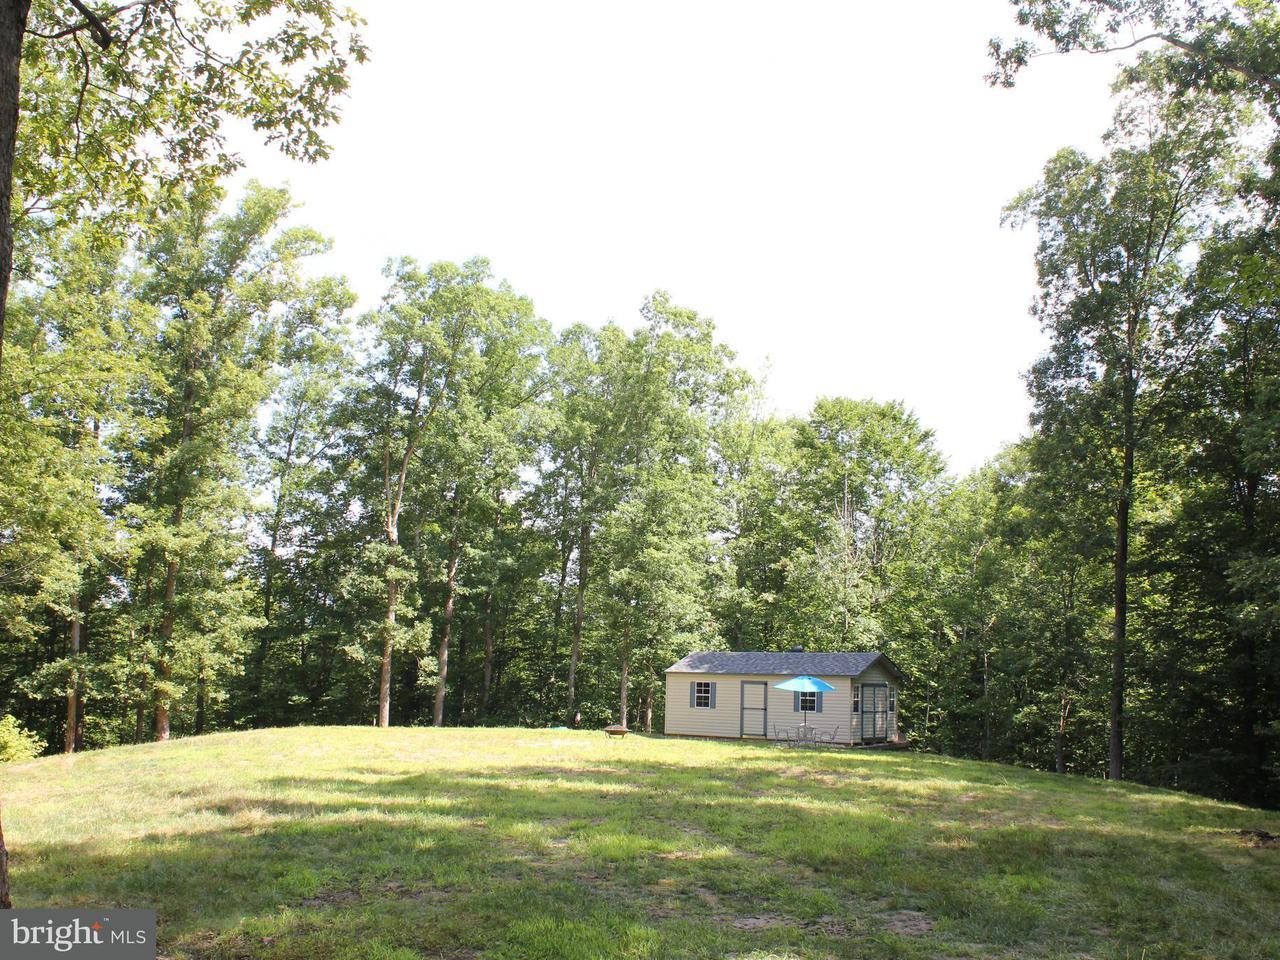 土地 為 出售 在 CRANES CORNER ROAD CRANES CORNER ROAD Fredericksburg, 弗吉尼亞州 22405 美國